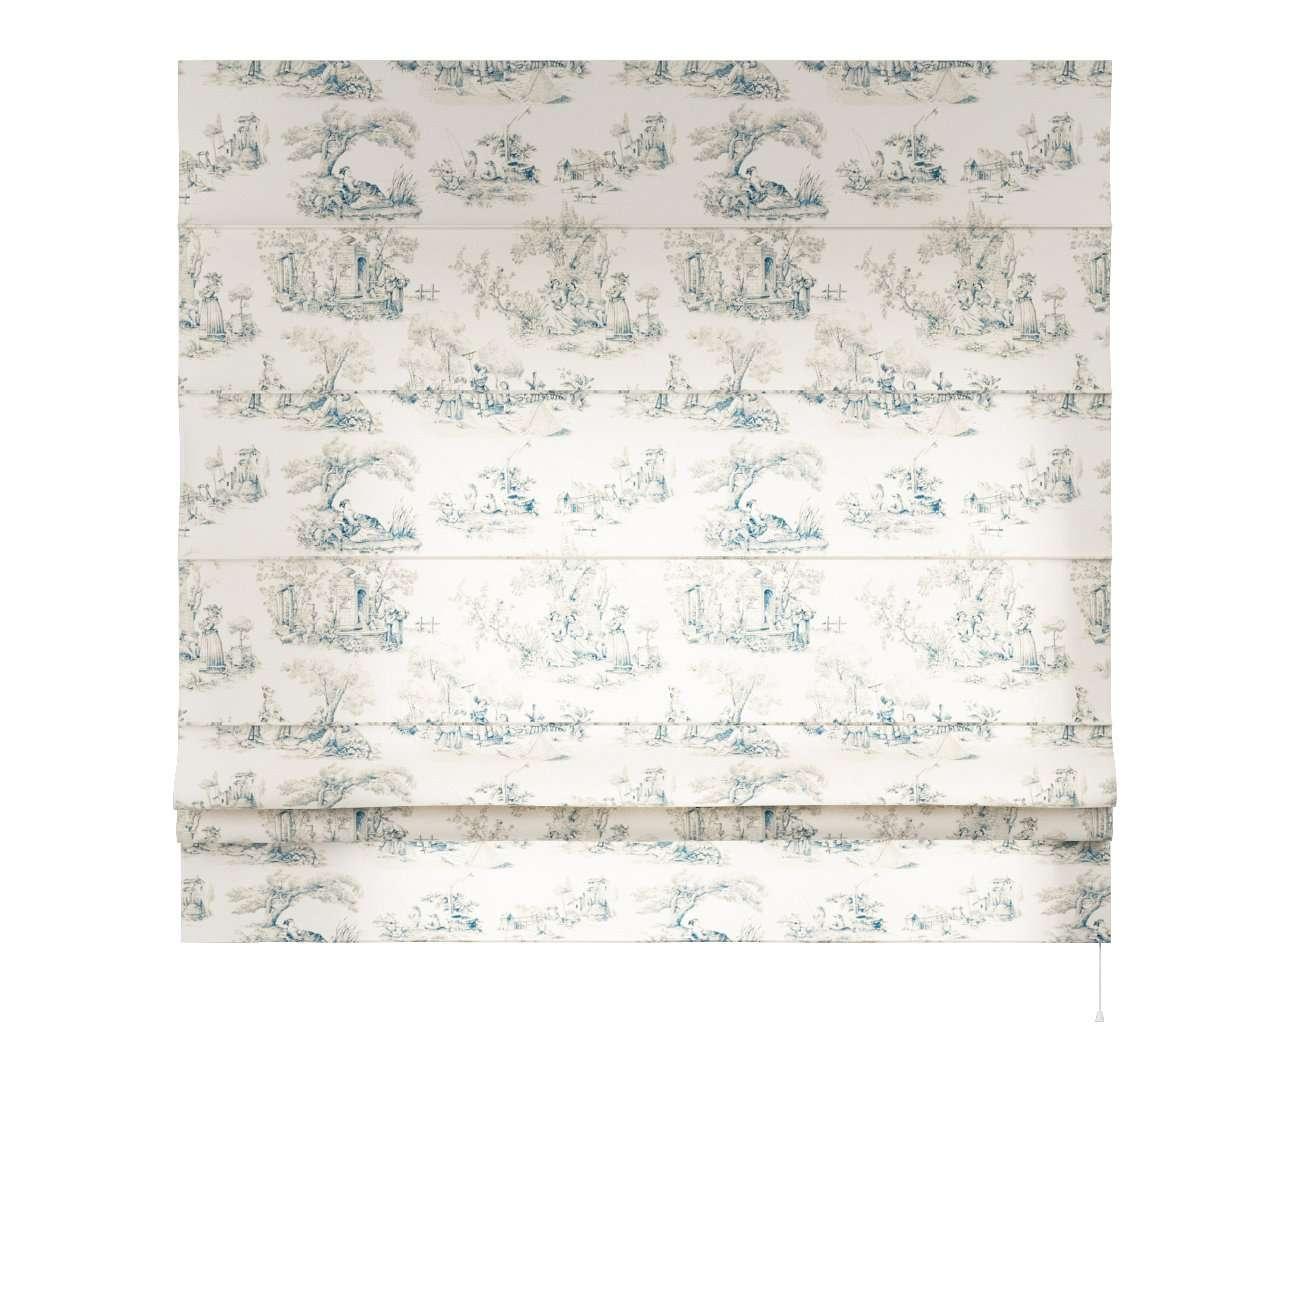 Roleta rzymska Padva w kolekcji Avinon, tkanina: 132-66